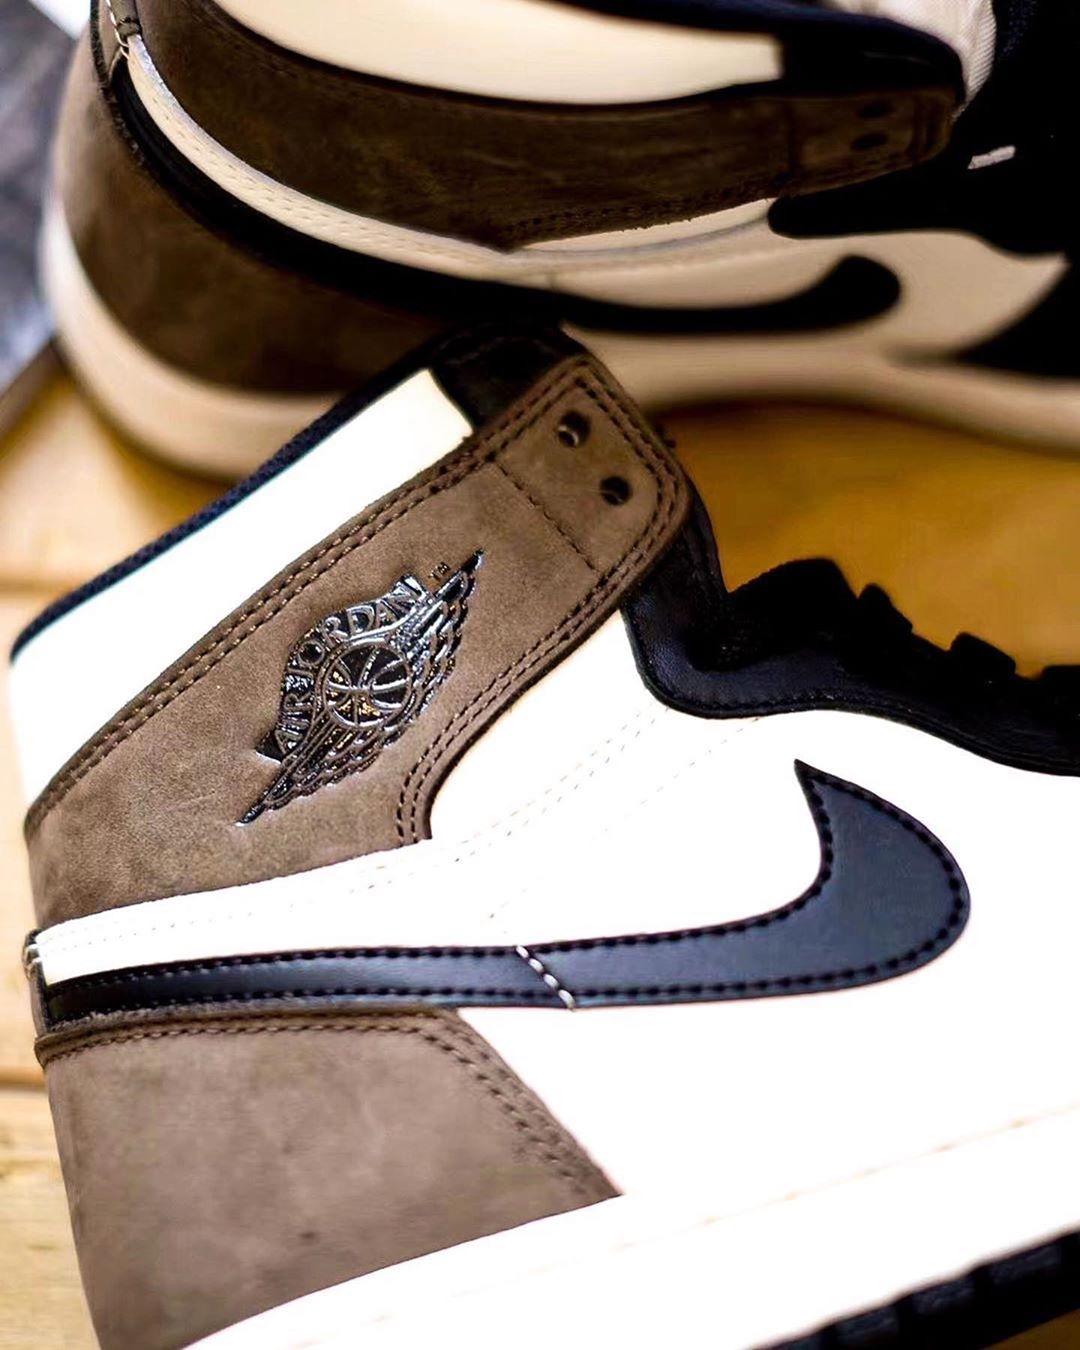 Air Jordan 1 High Dark Mocha dettaglio Swoosh